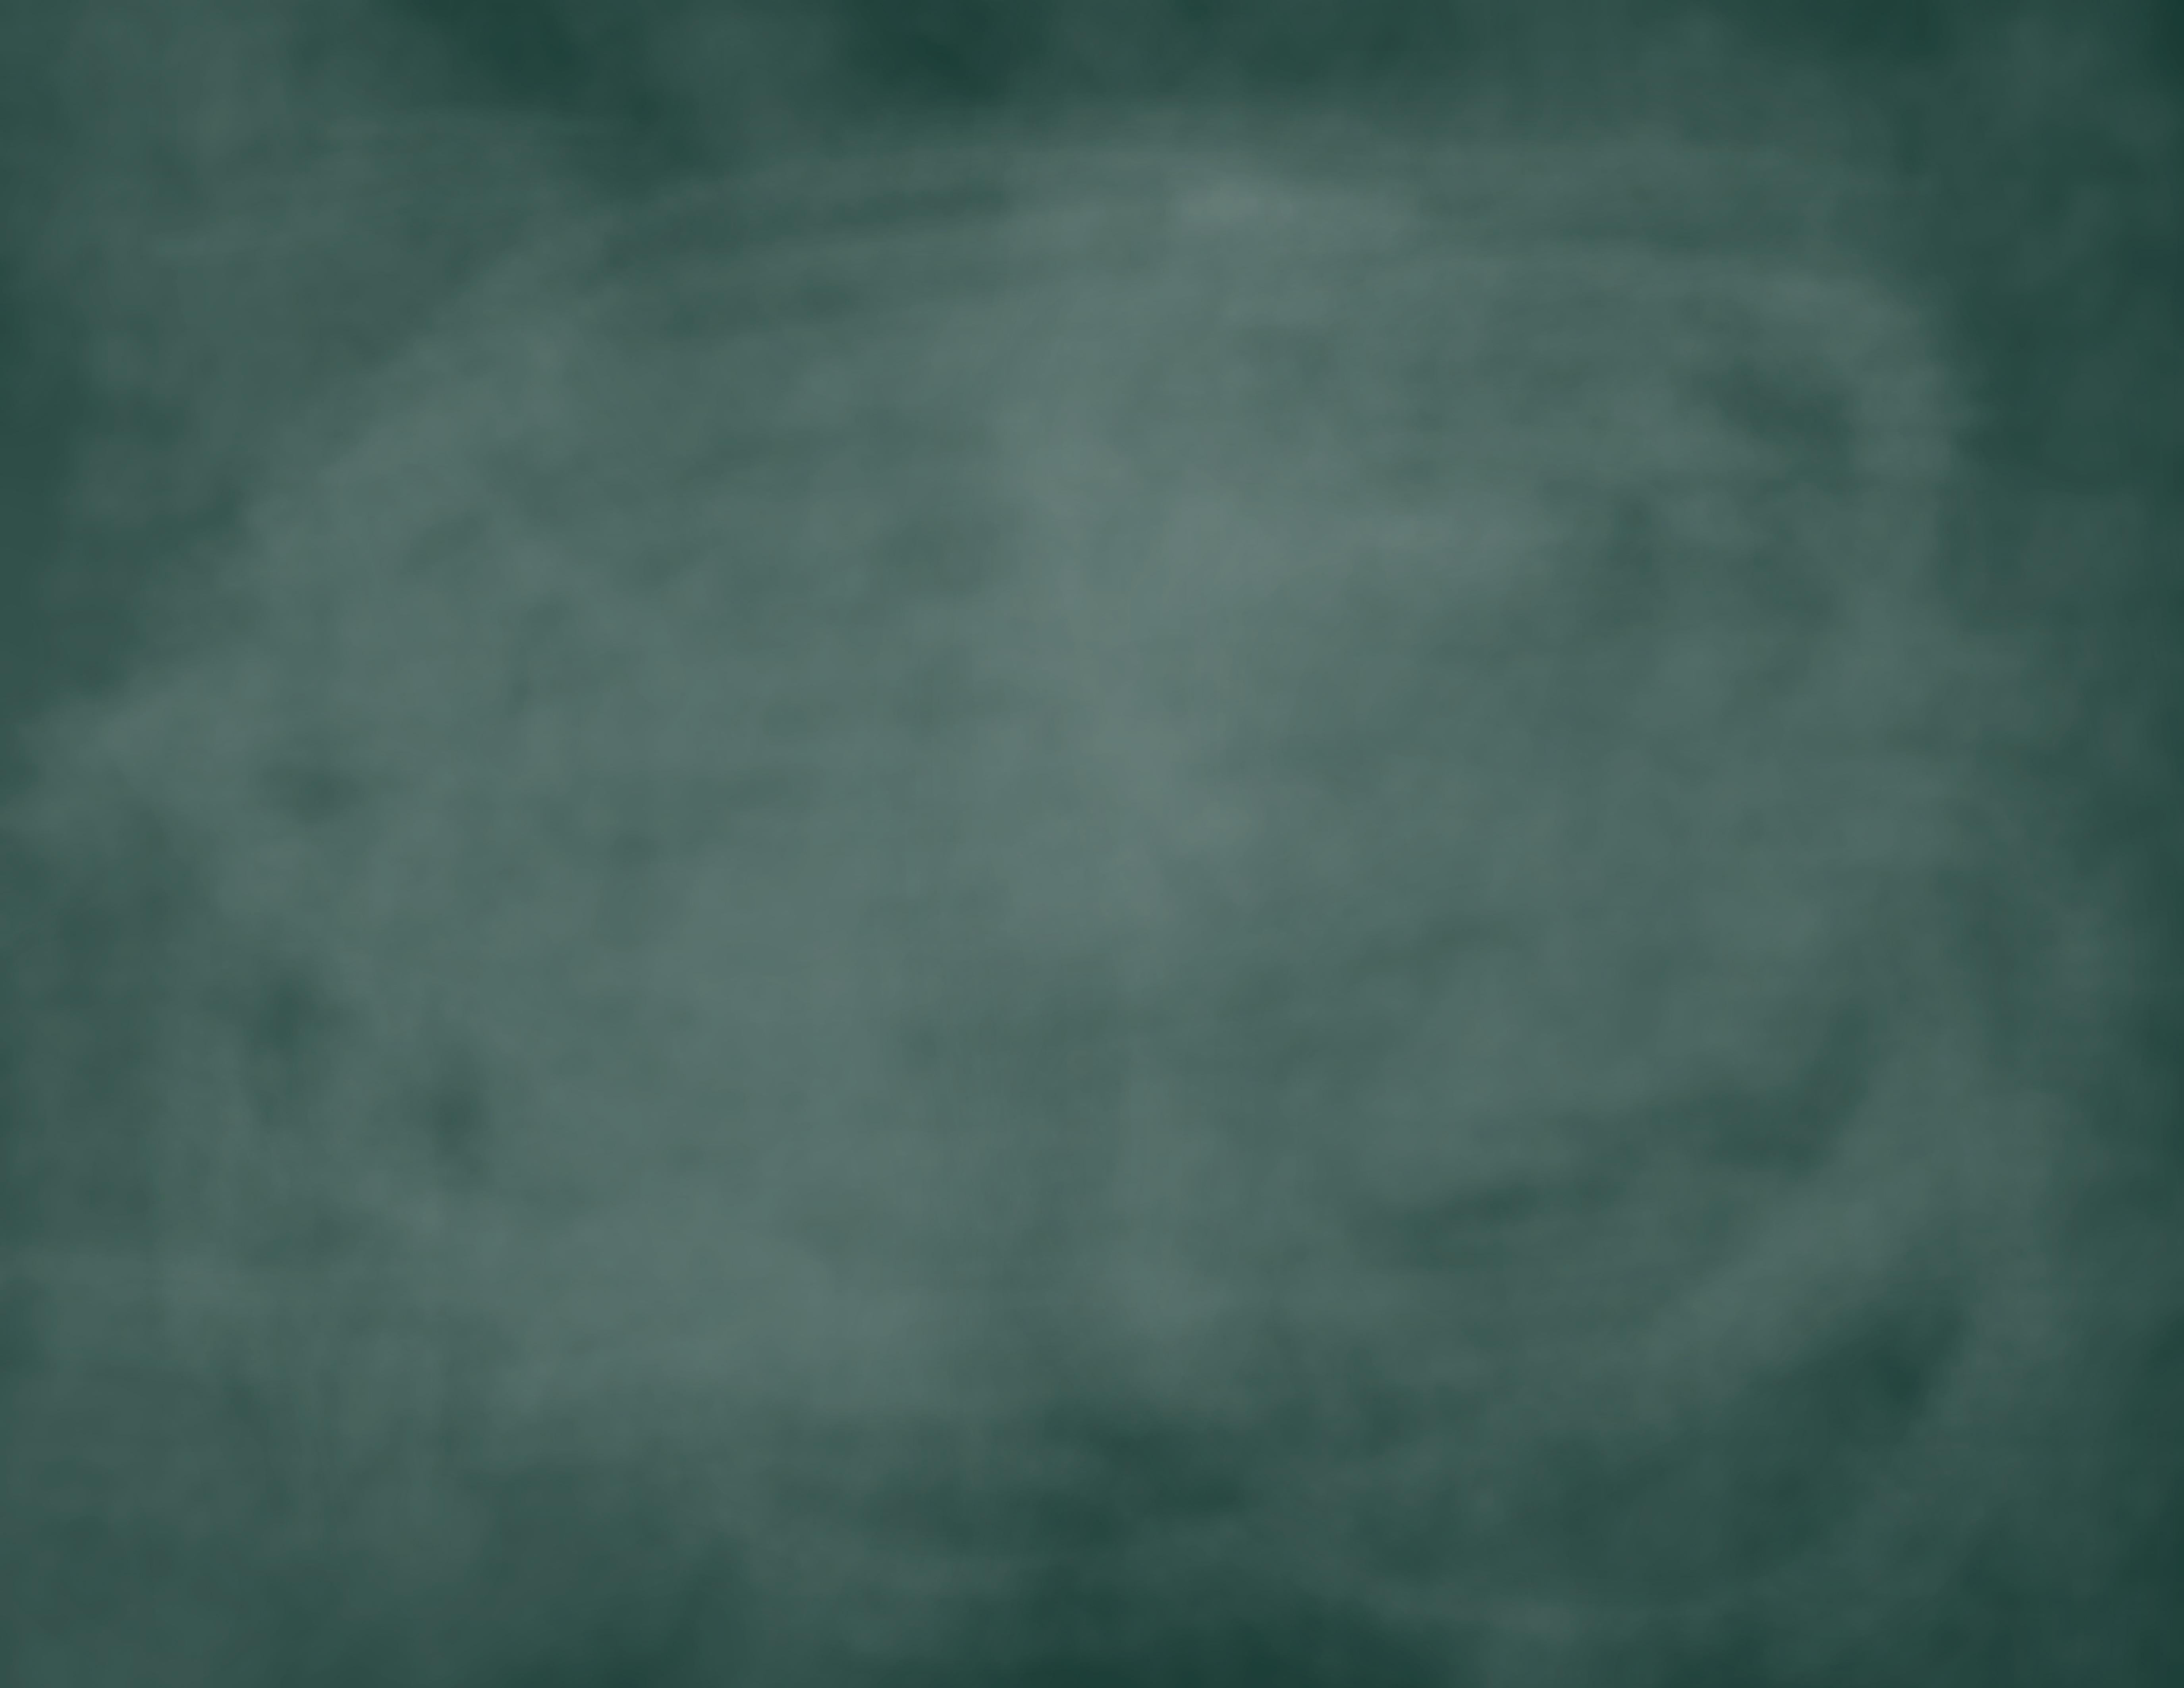 Chalkboard Freebies Photobookgirlcom